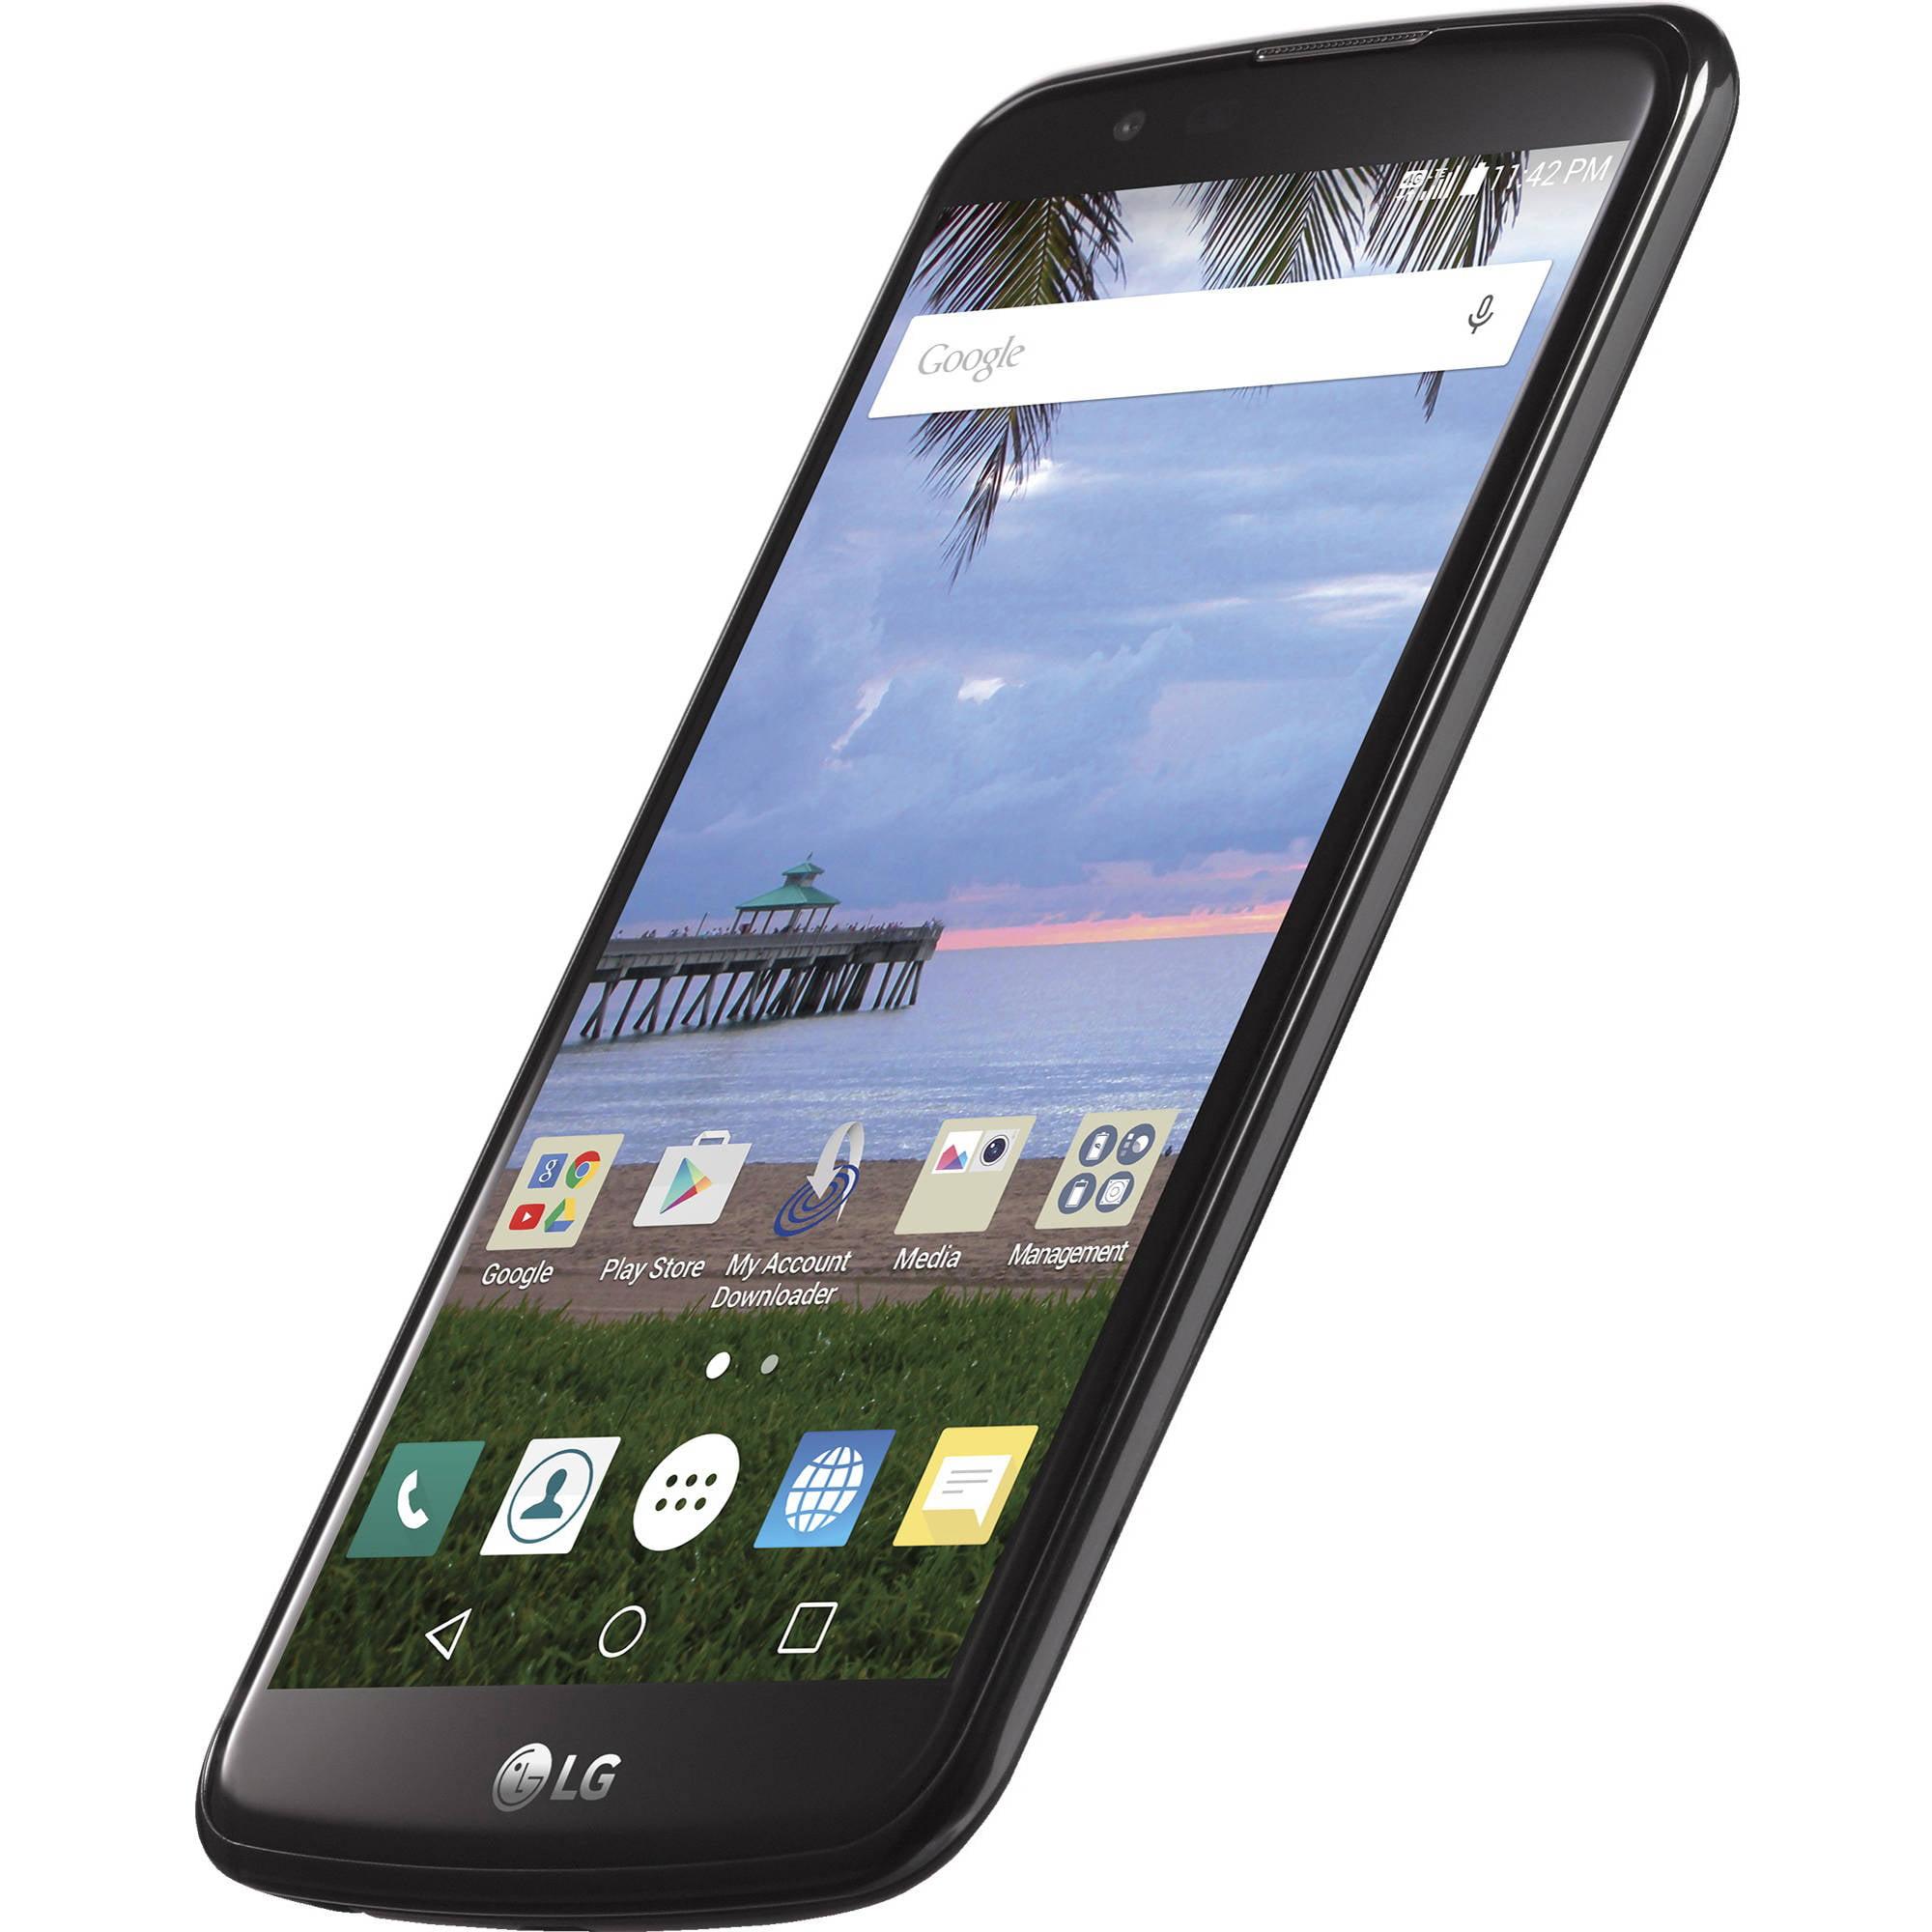 Total Wireless LG Premier 8GB Prepaid Smartphone, Black